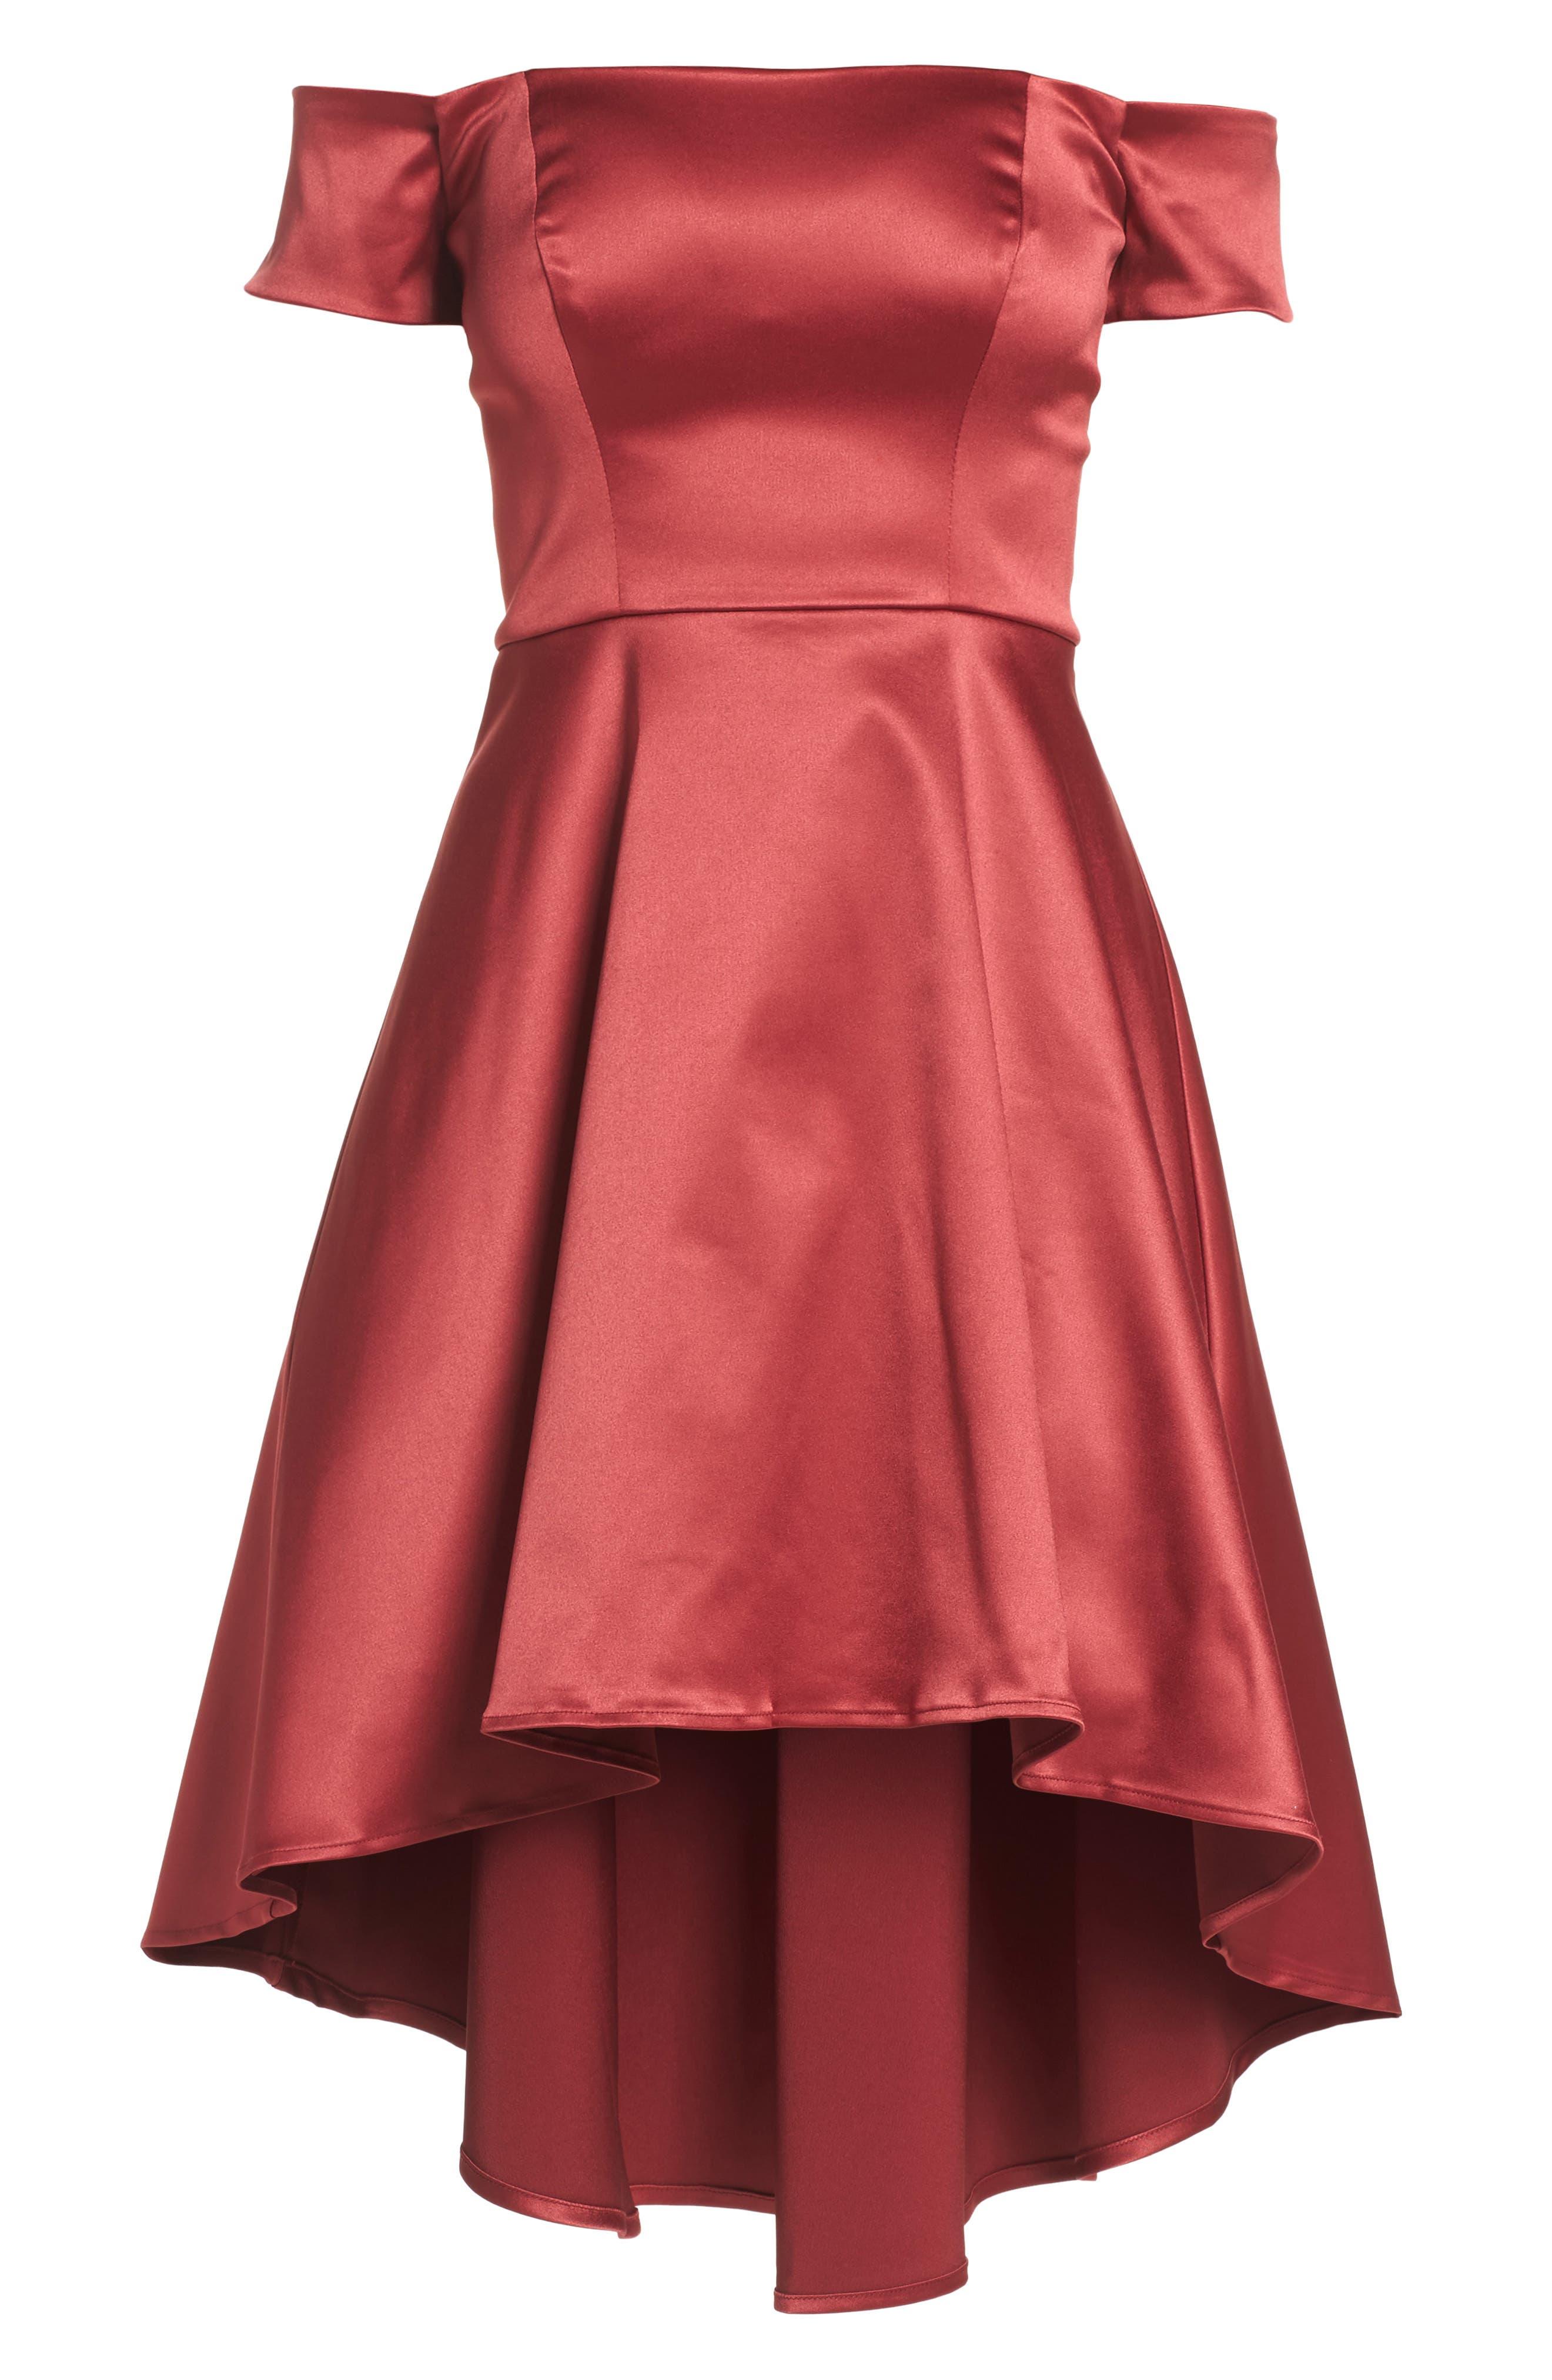 Off the Shoulder Satin Dress,                             Alternate thumbnail 6, color,                             503